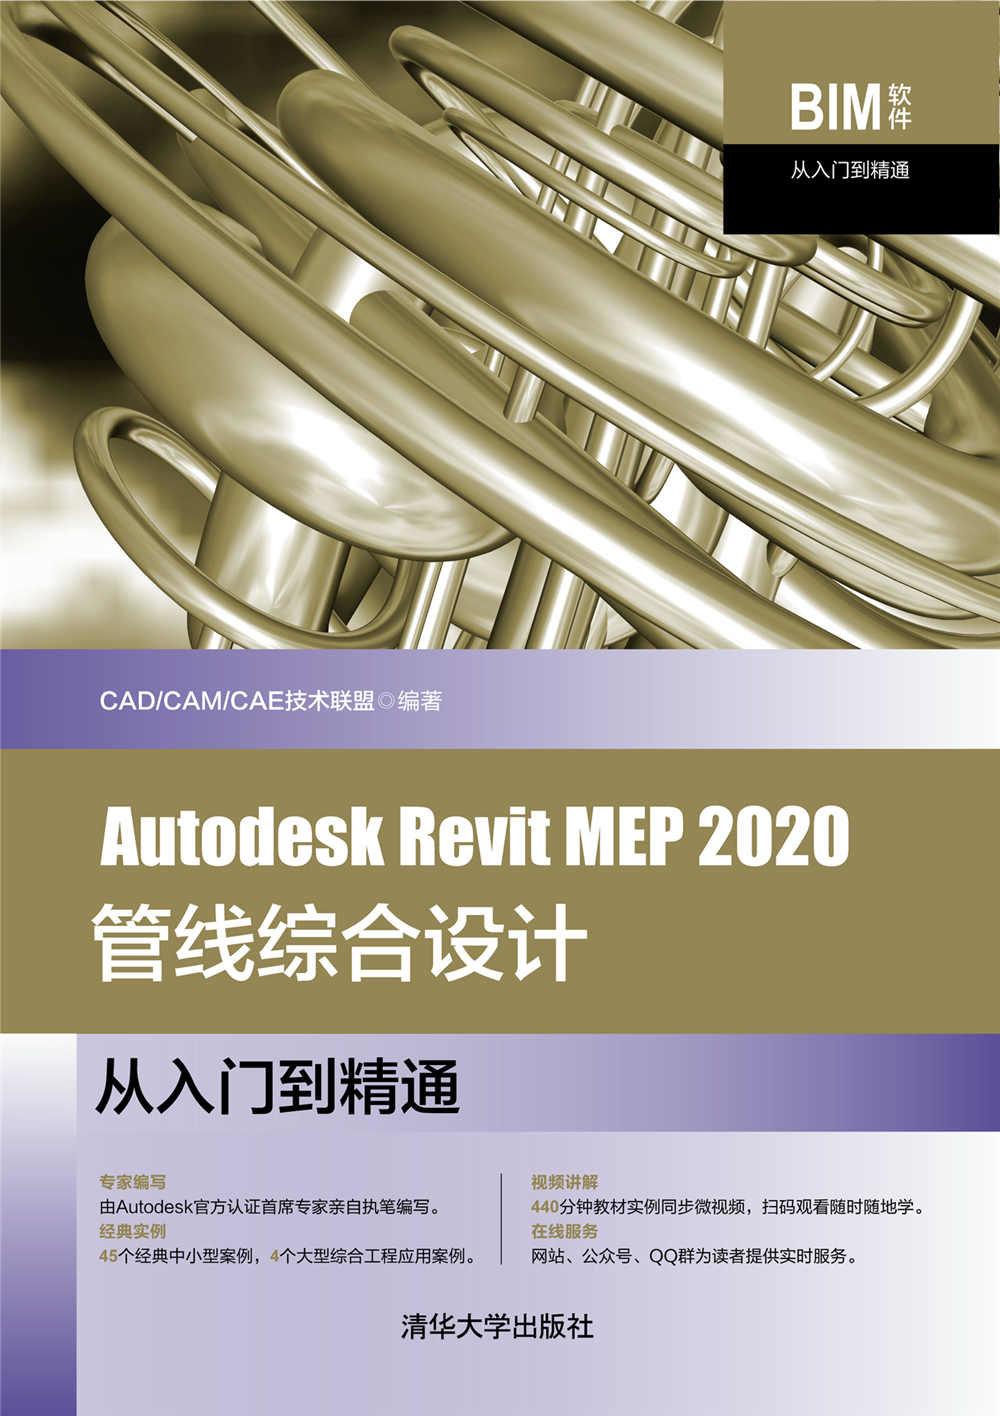 Autodesk Revit MEP 2020管線綜合設計從入門到精通-preview-1